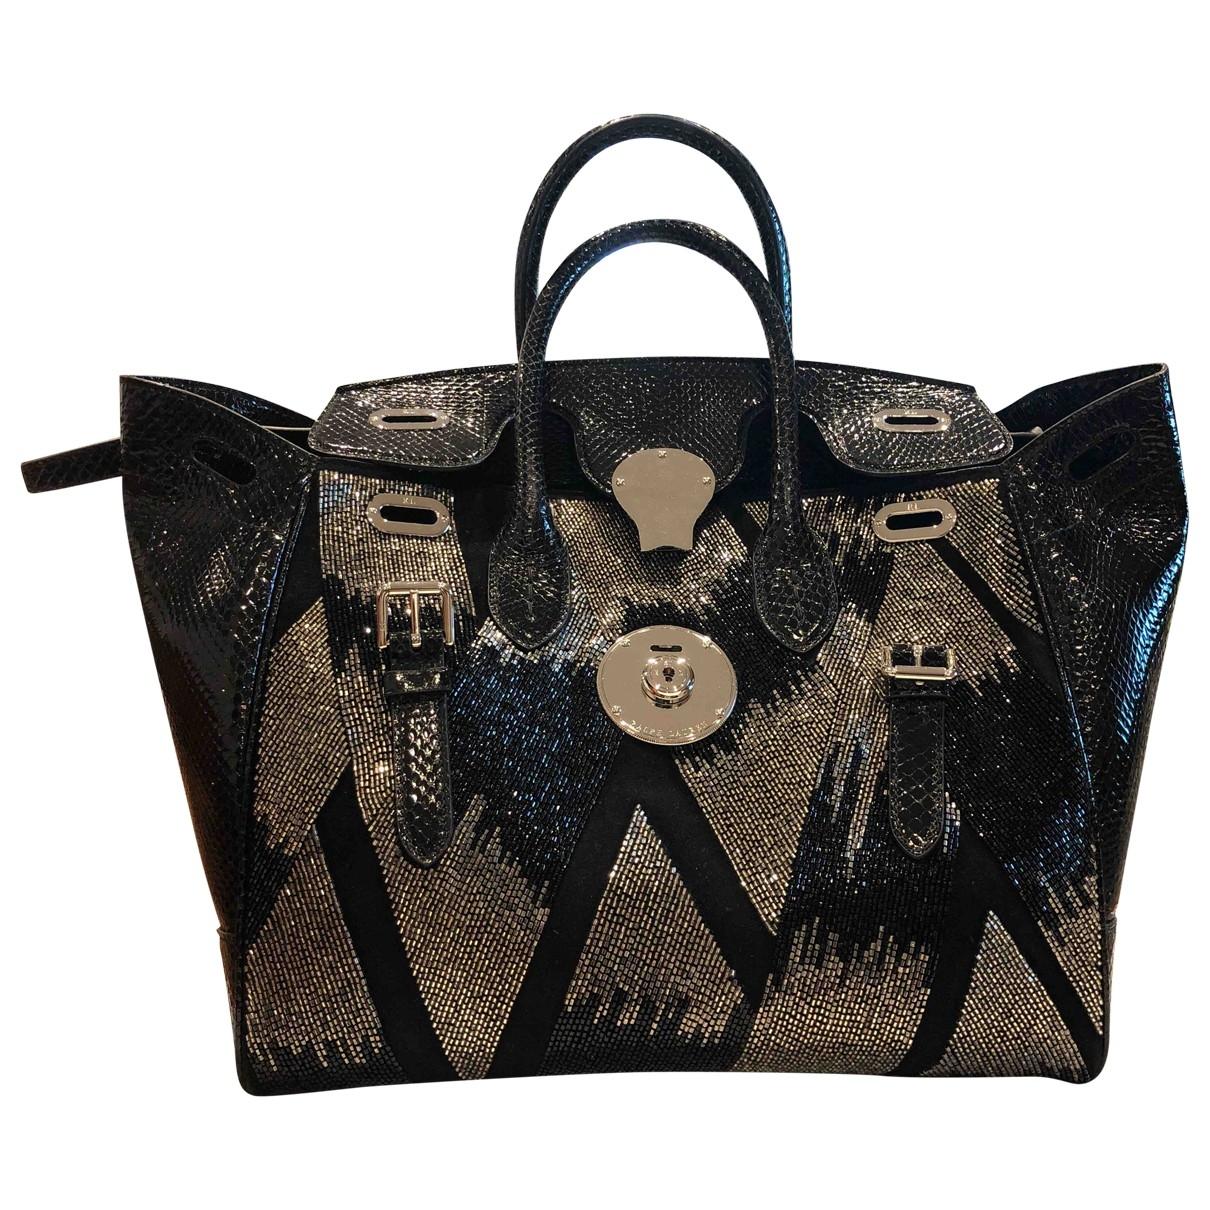 Ralph Lauren Collection \N Handtasche in  Schwarz Exotenleder